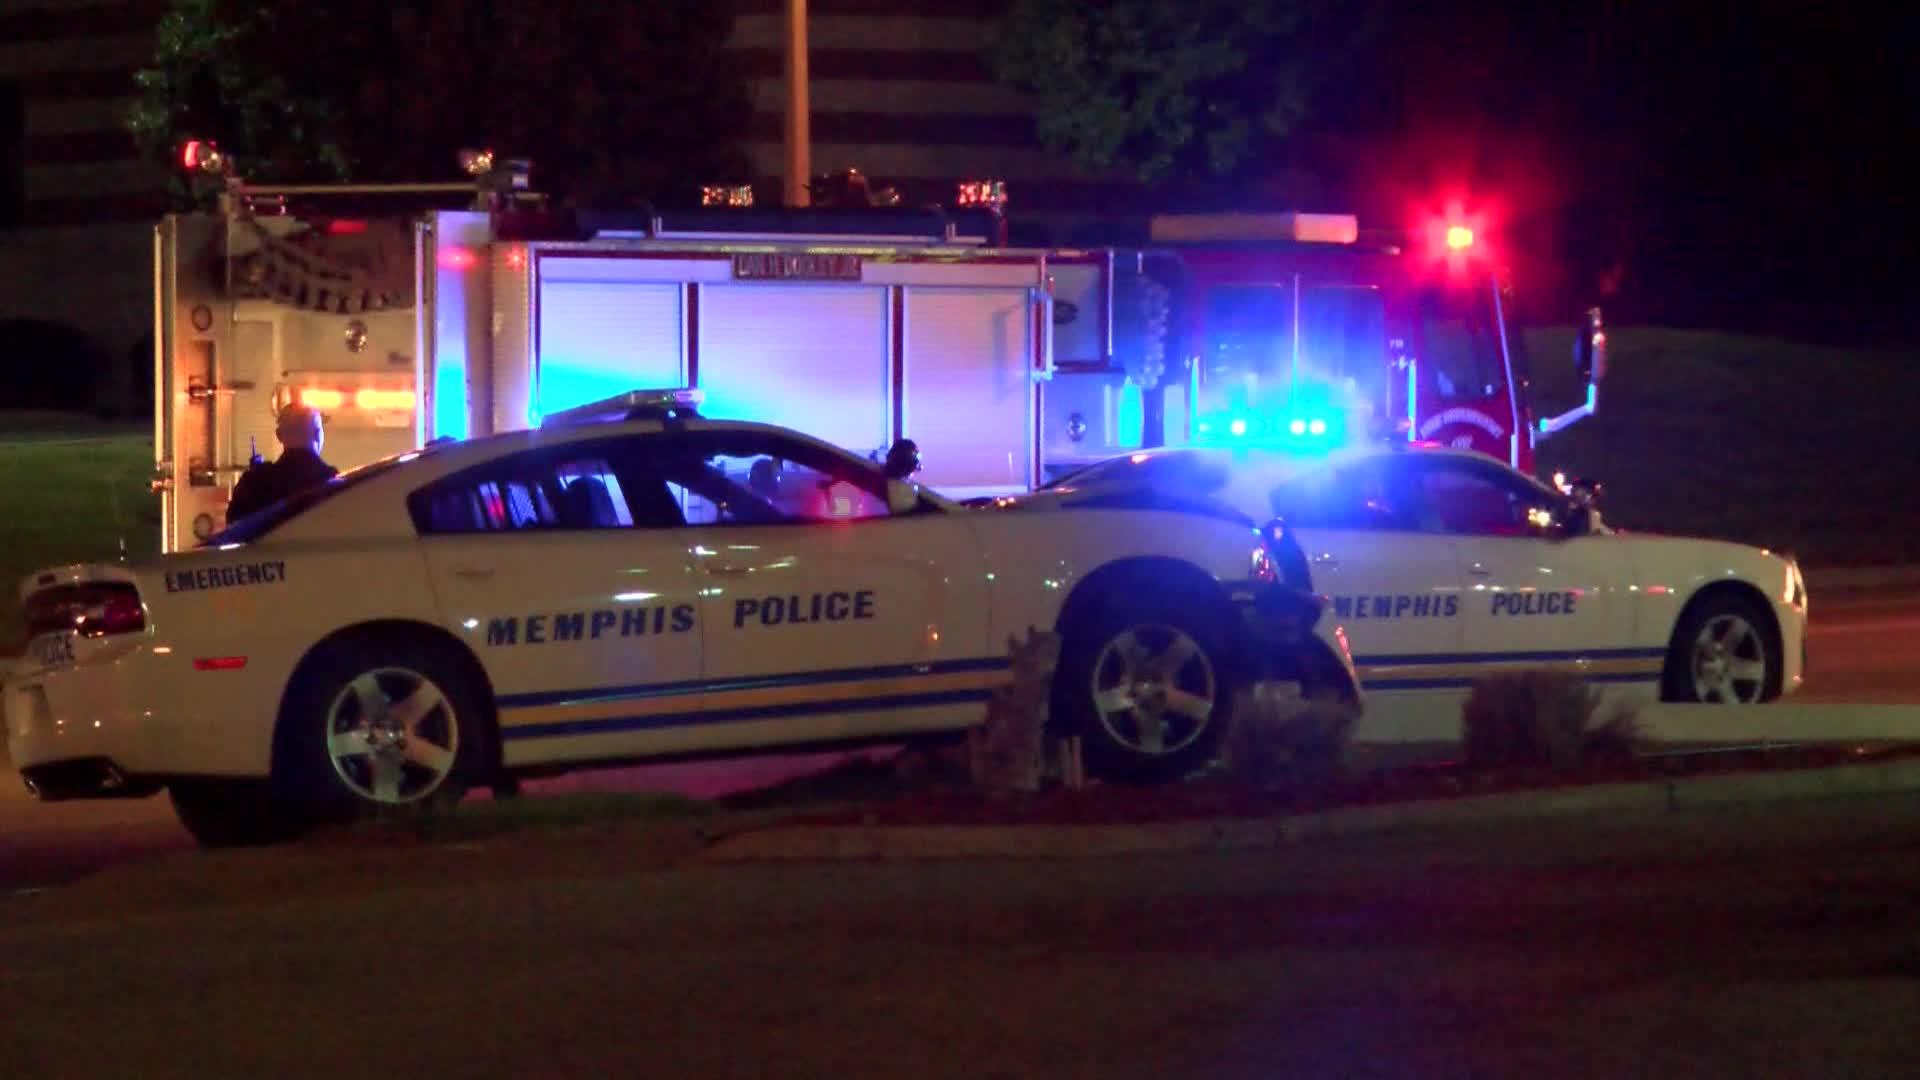 Crump (TN) United States  city photos gallery : Memphis, TN : Memphis Police Department cruiser involved in crash on ...